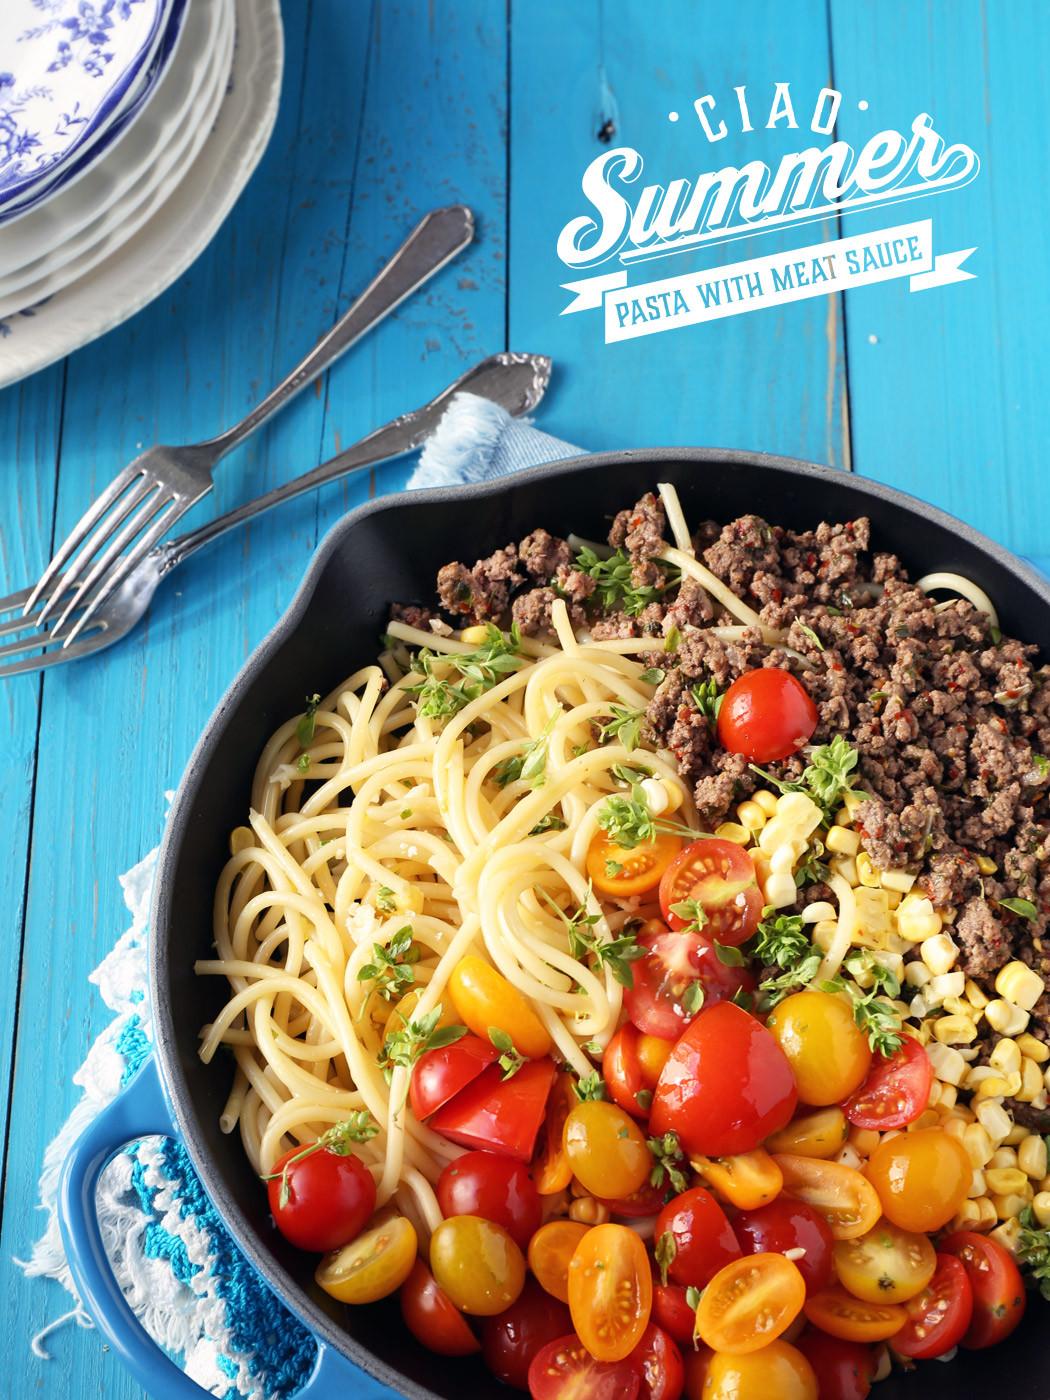 Summer Pasta Sauces  Ciao Summer Pasta with Meatsauce